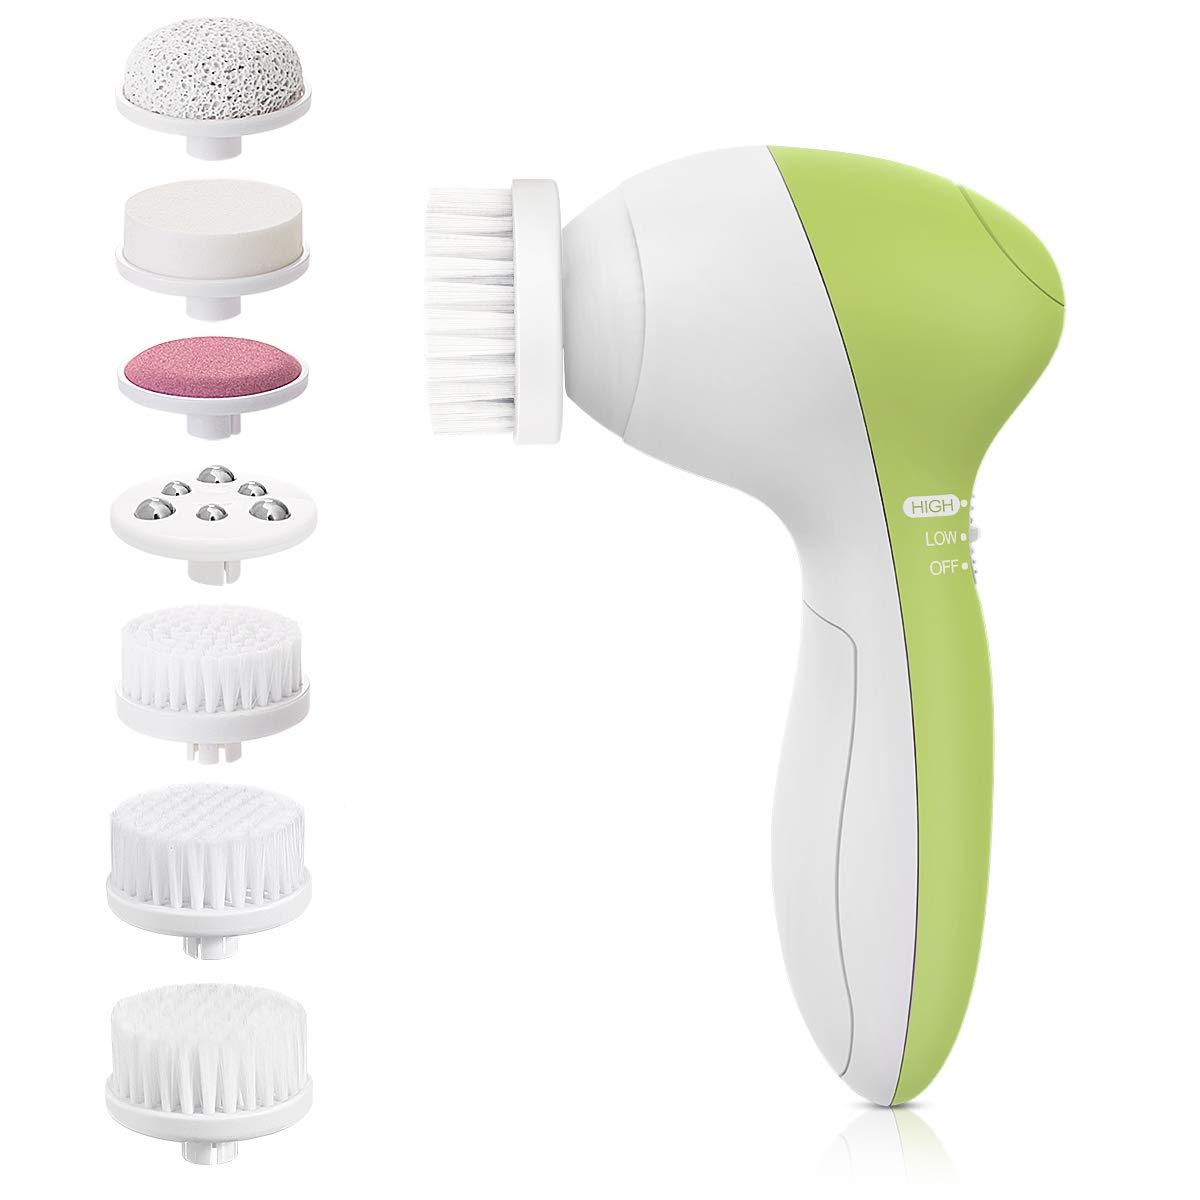 Facial Cleansing Brush, Face Brush Waterproof Exfoliating Brush with 7 Brush Heads - Yellow Green